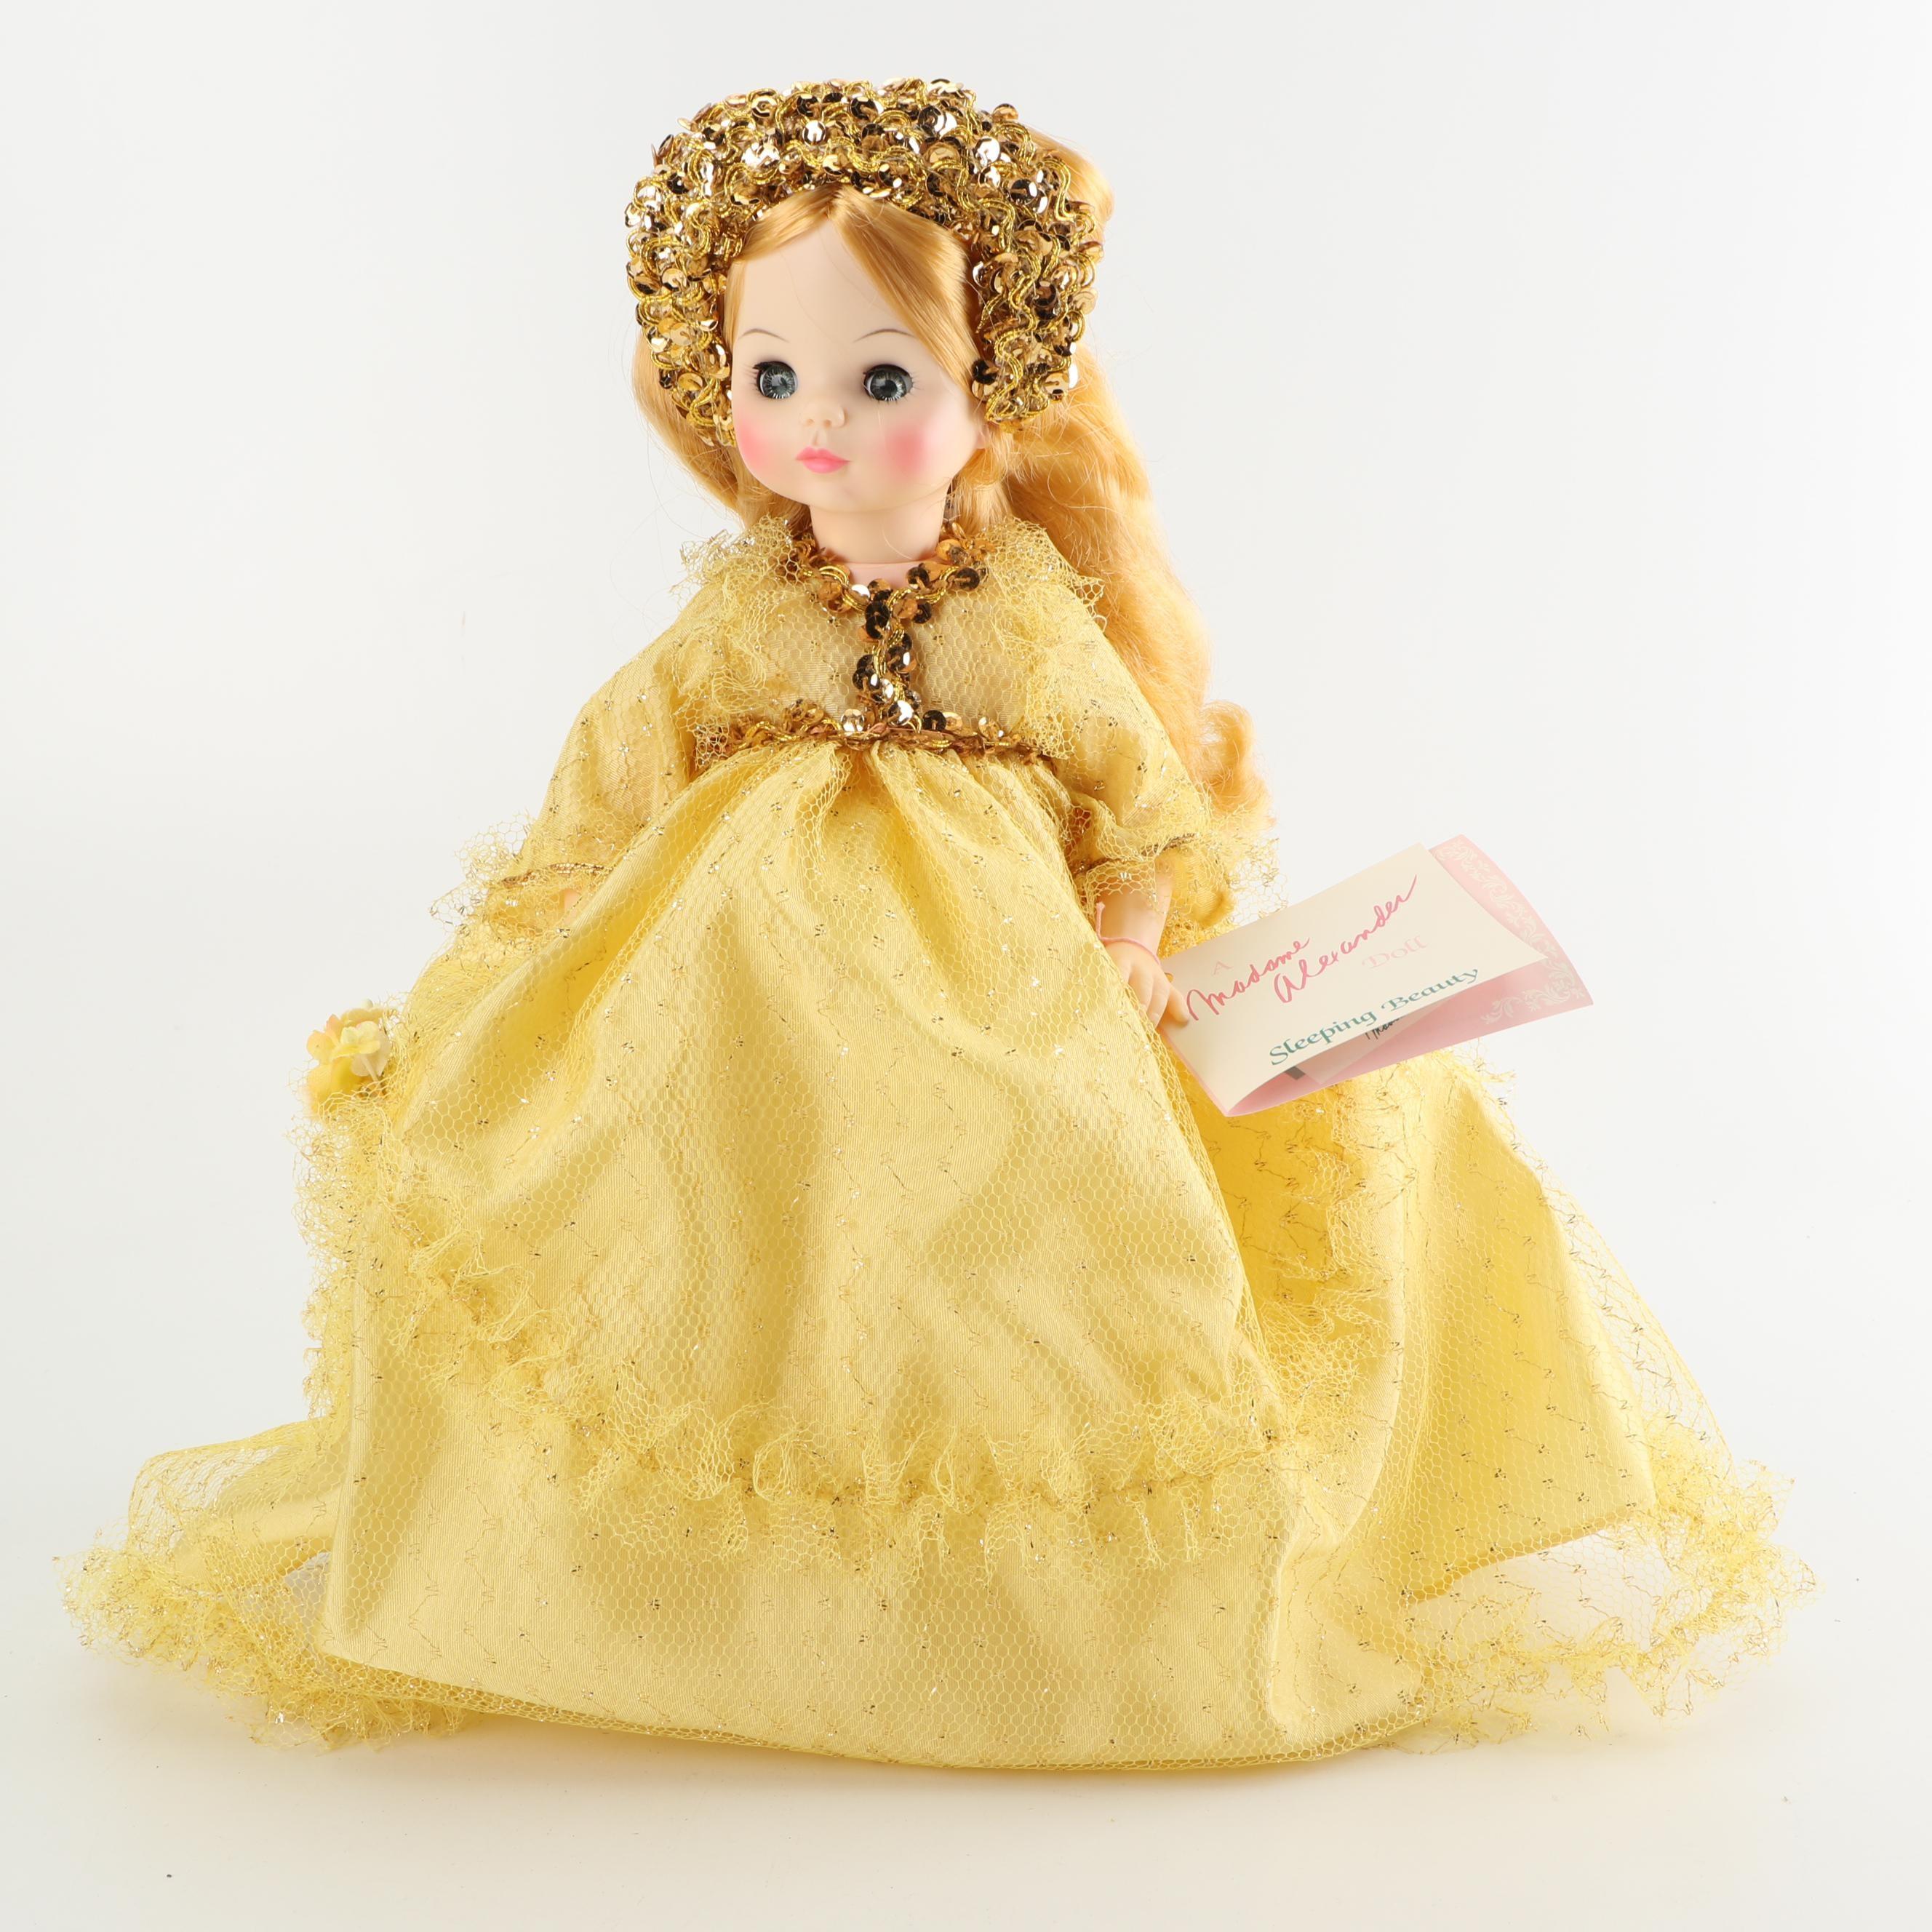 Madame Alexander Sleeping Beauty Doll